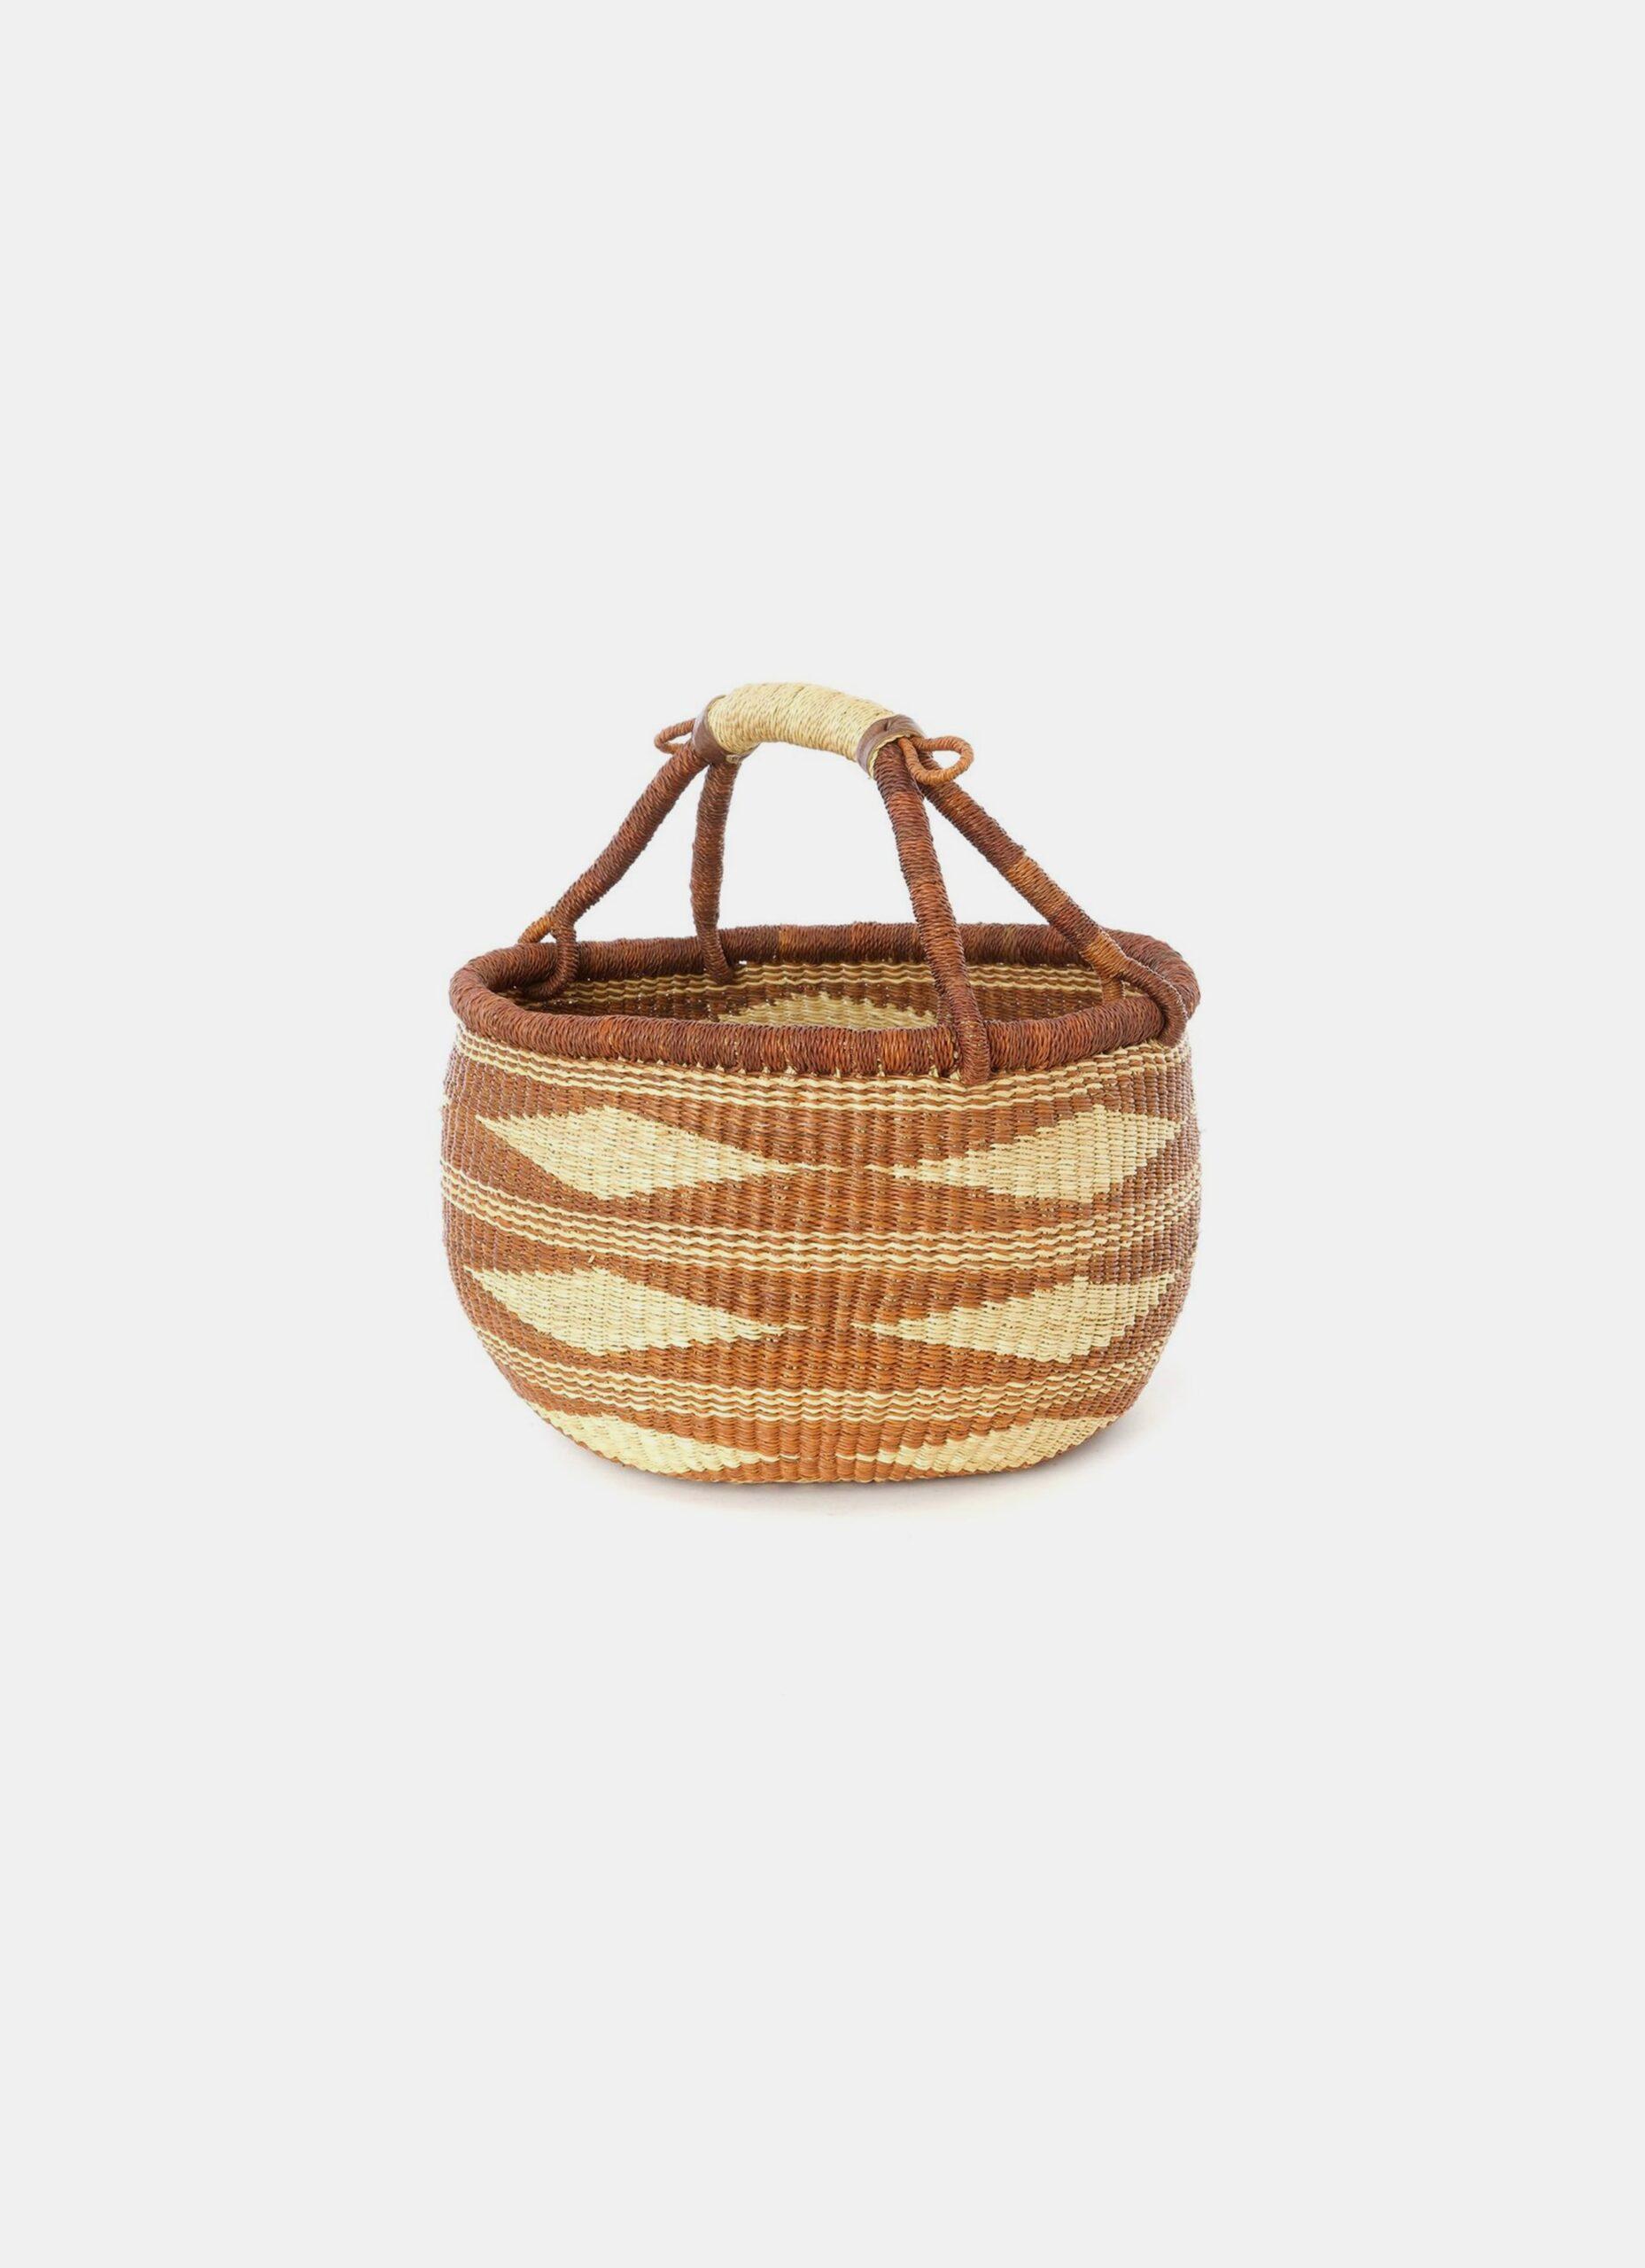 Handwoven African Basket - Bolga - Diamond weaving - Natural and Caramel